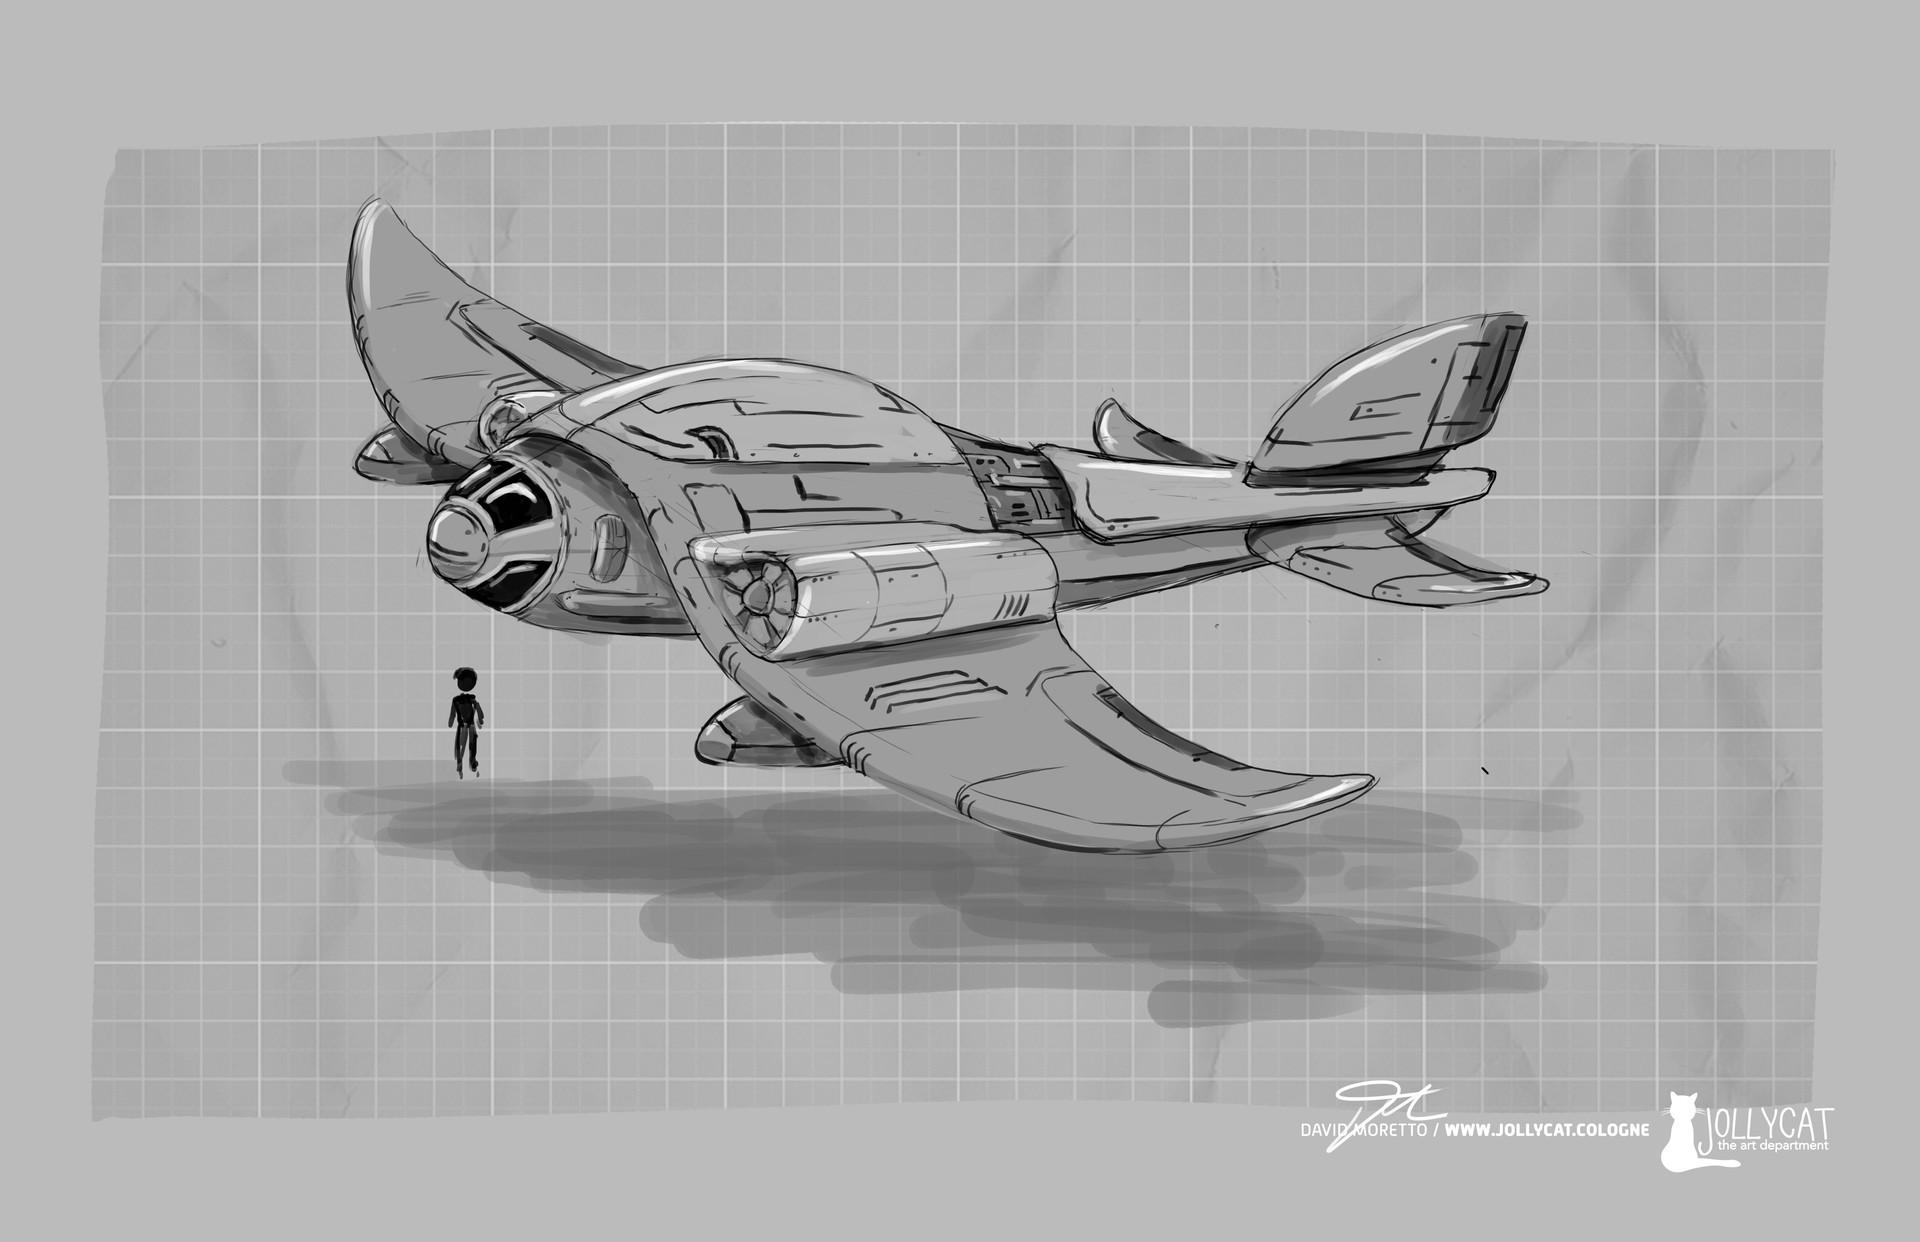 David moretto hardware plane v1